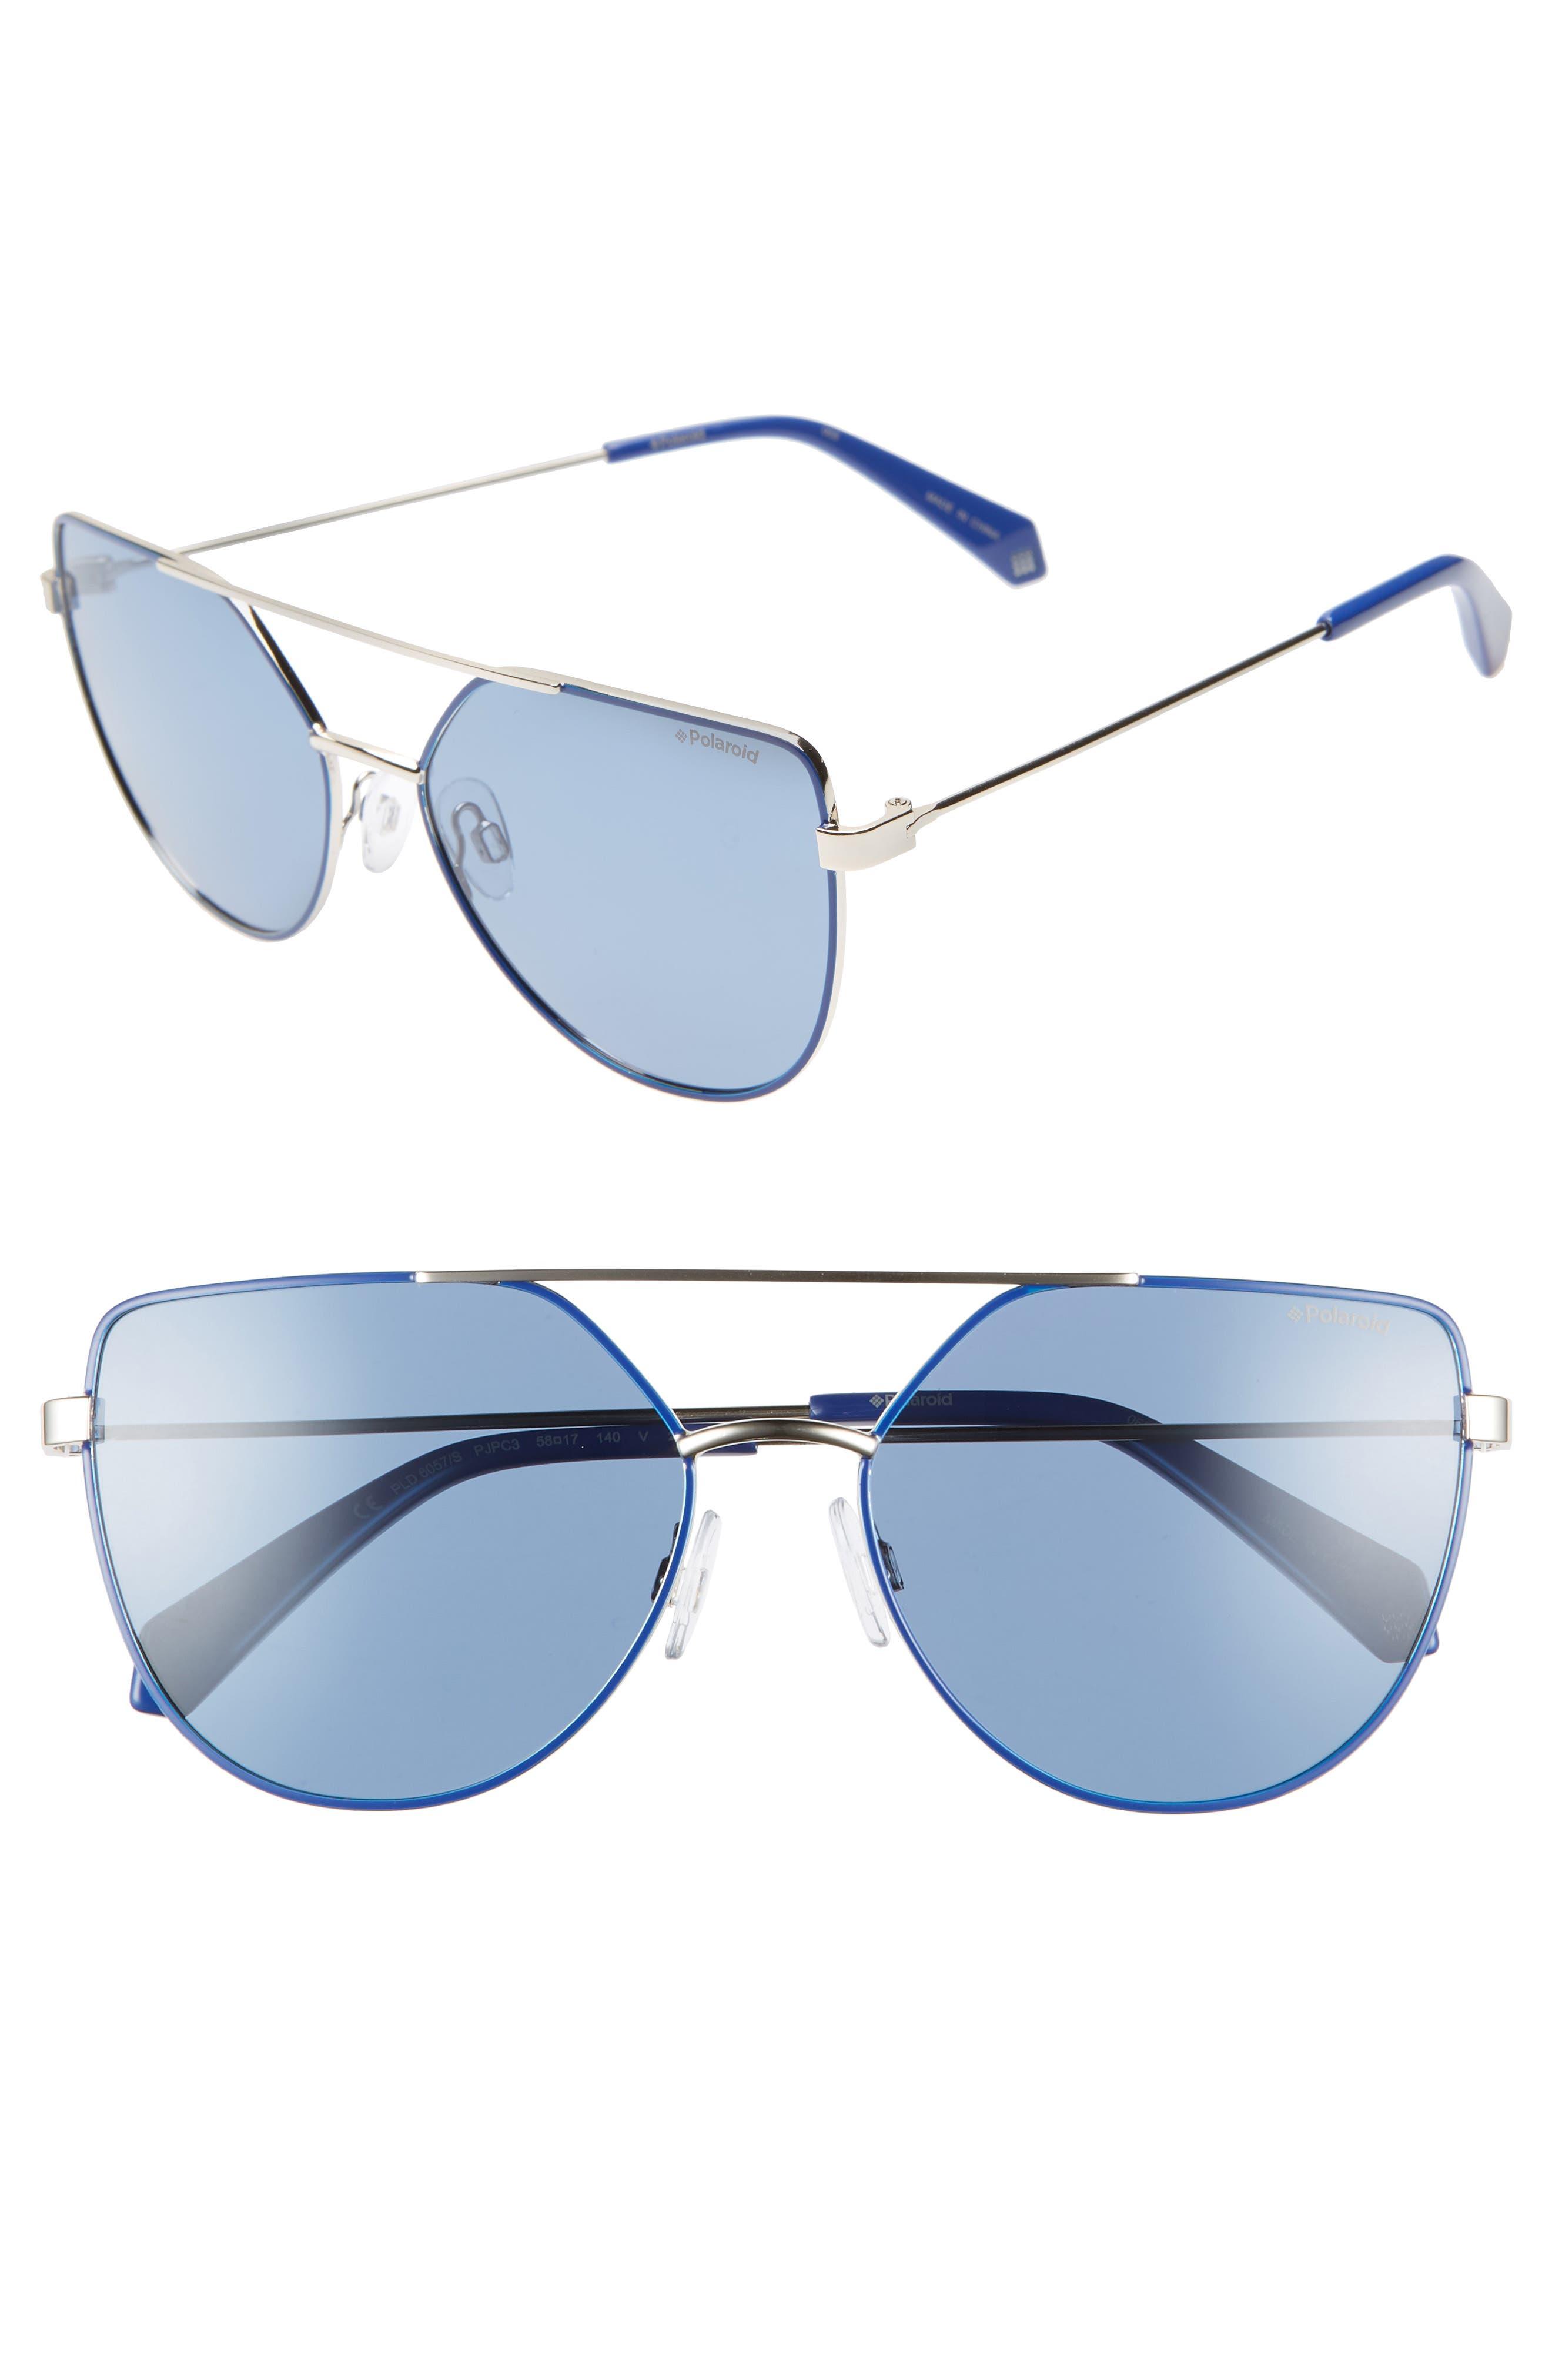 Polaroid 5m Polarized Sunglasses - Blue/ Gold